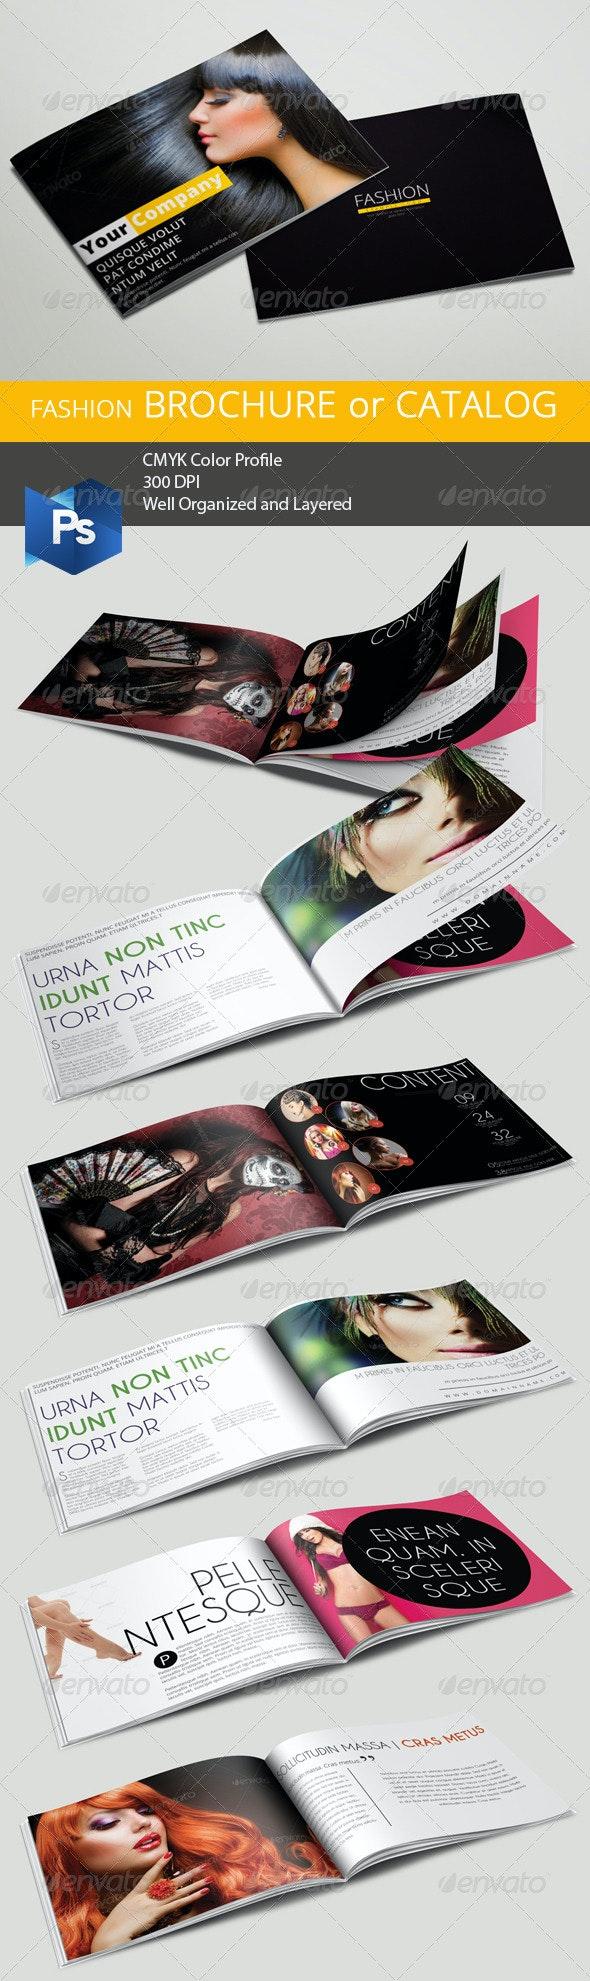 A5 Fashion Brochure/Catalog - Corporate Brochures